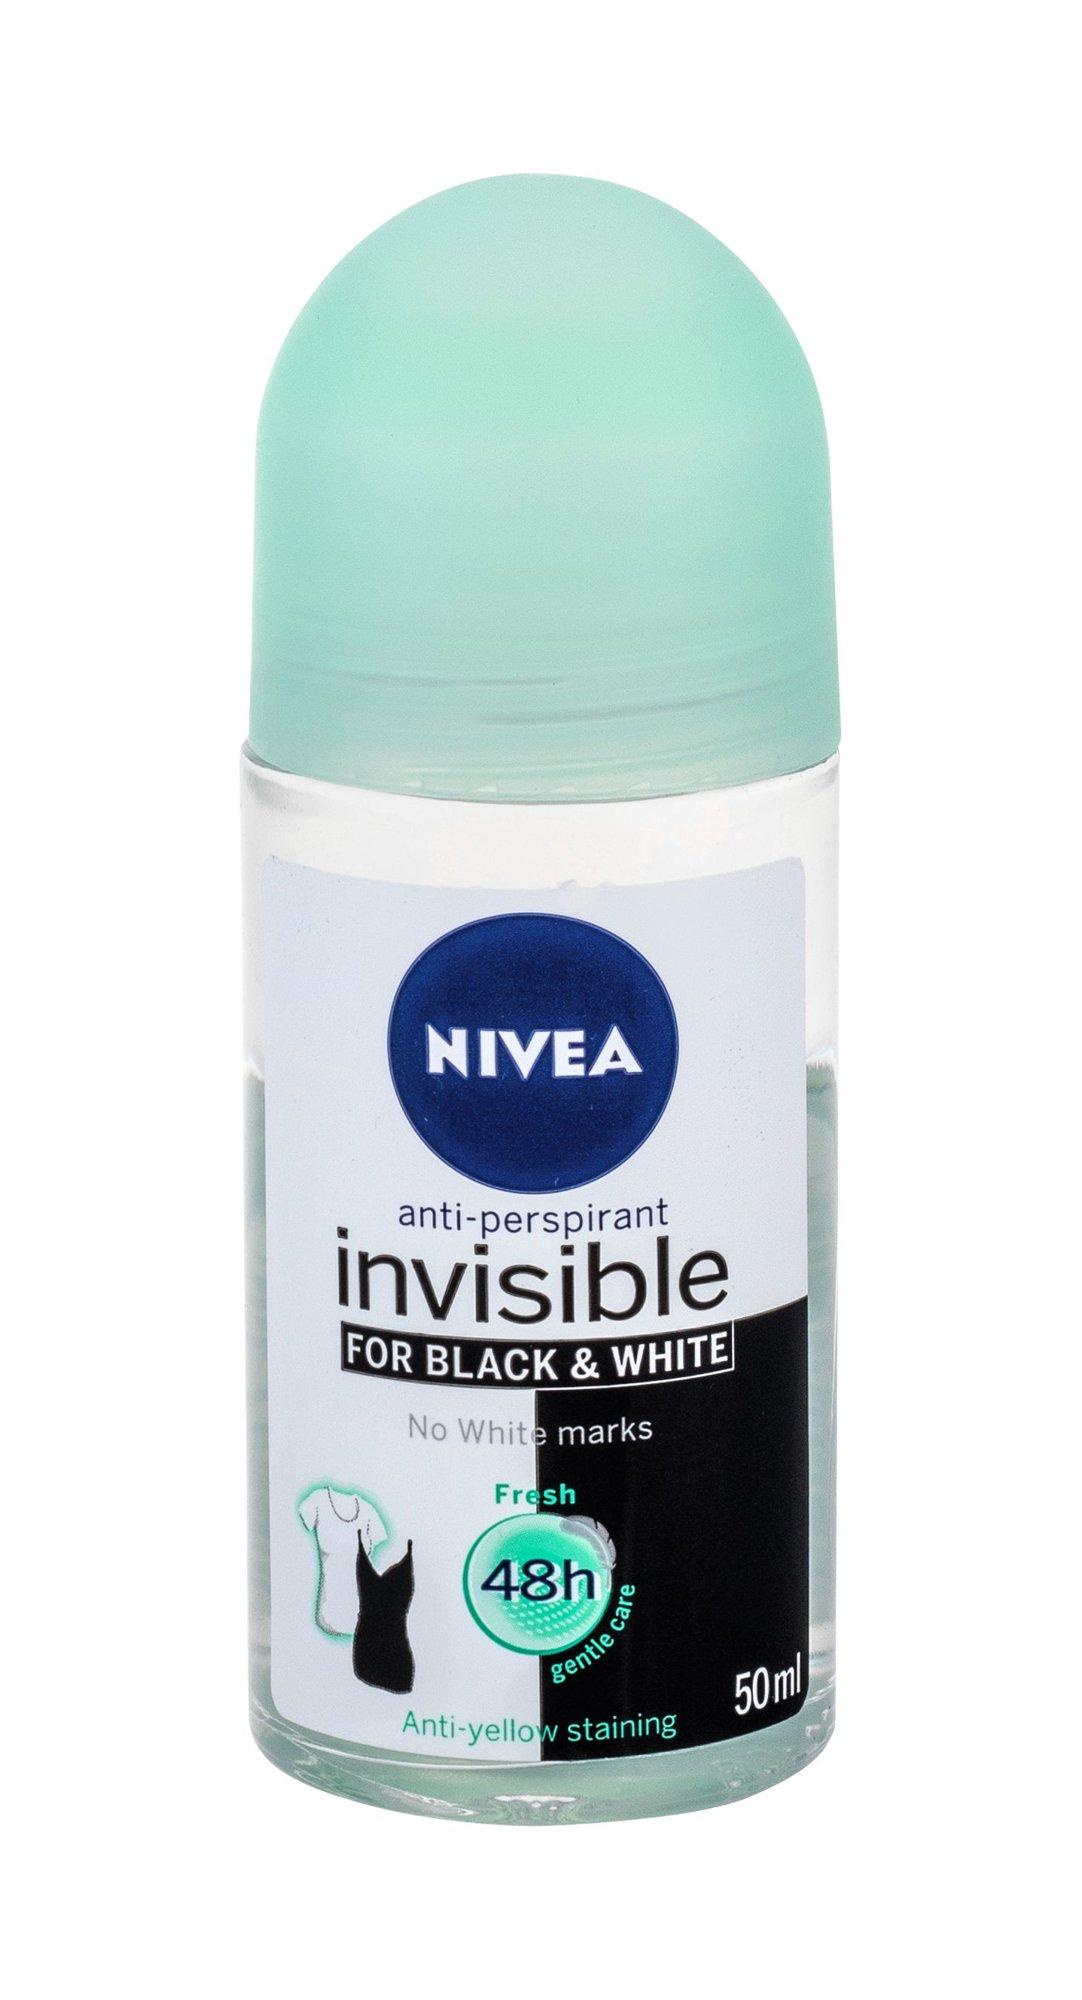 Nivea Invisible For Black & White Antiperspirant 50ml